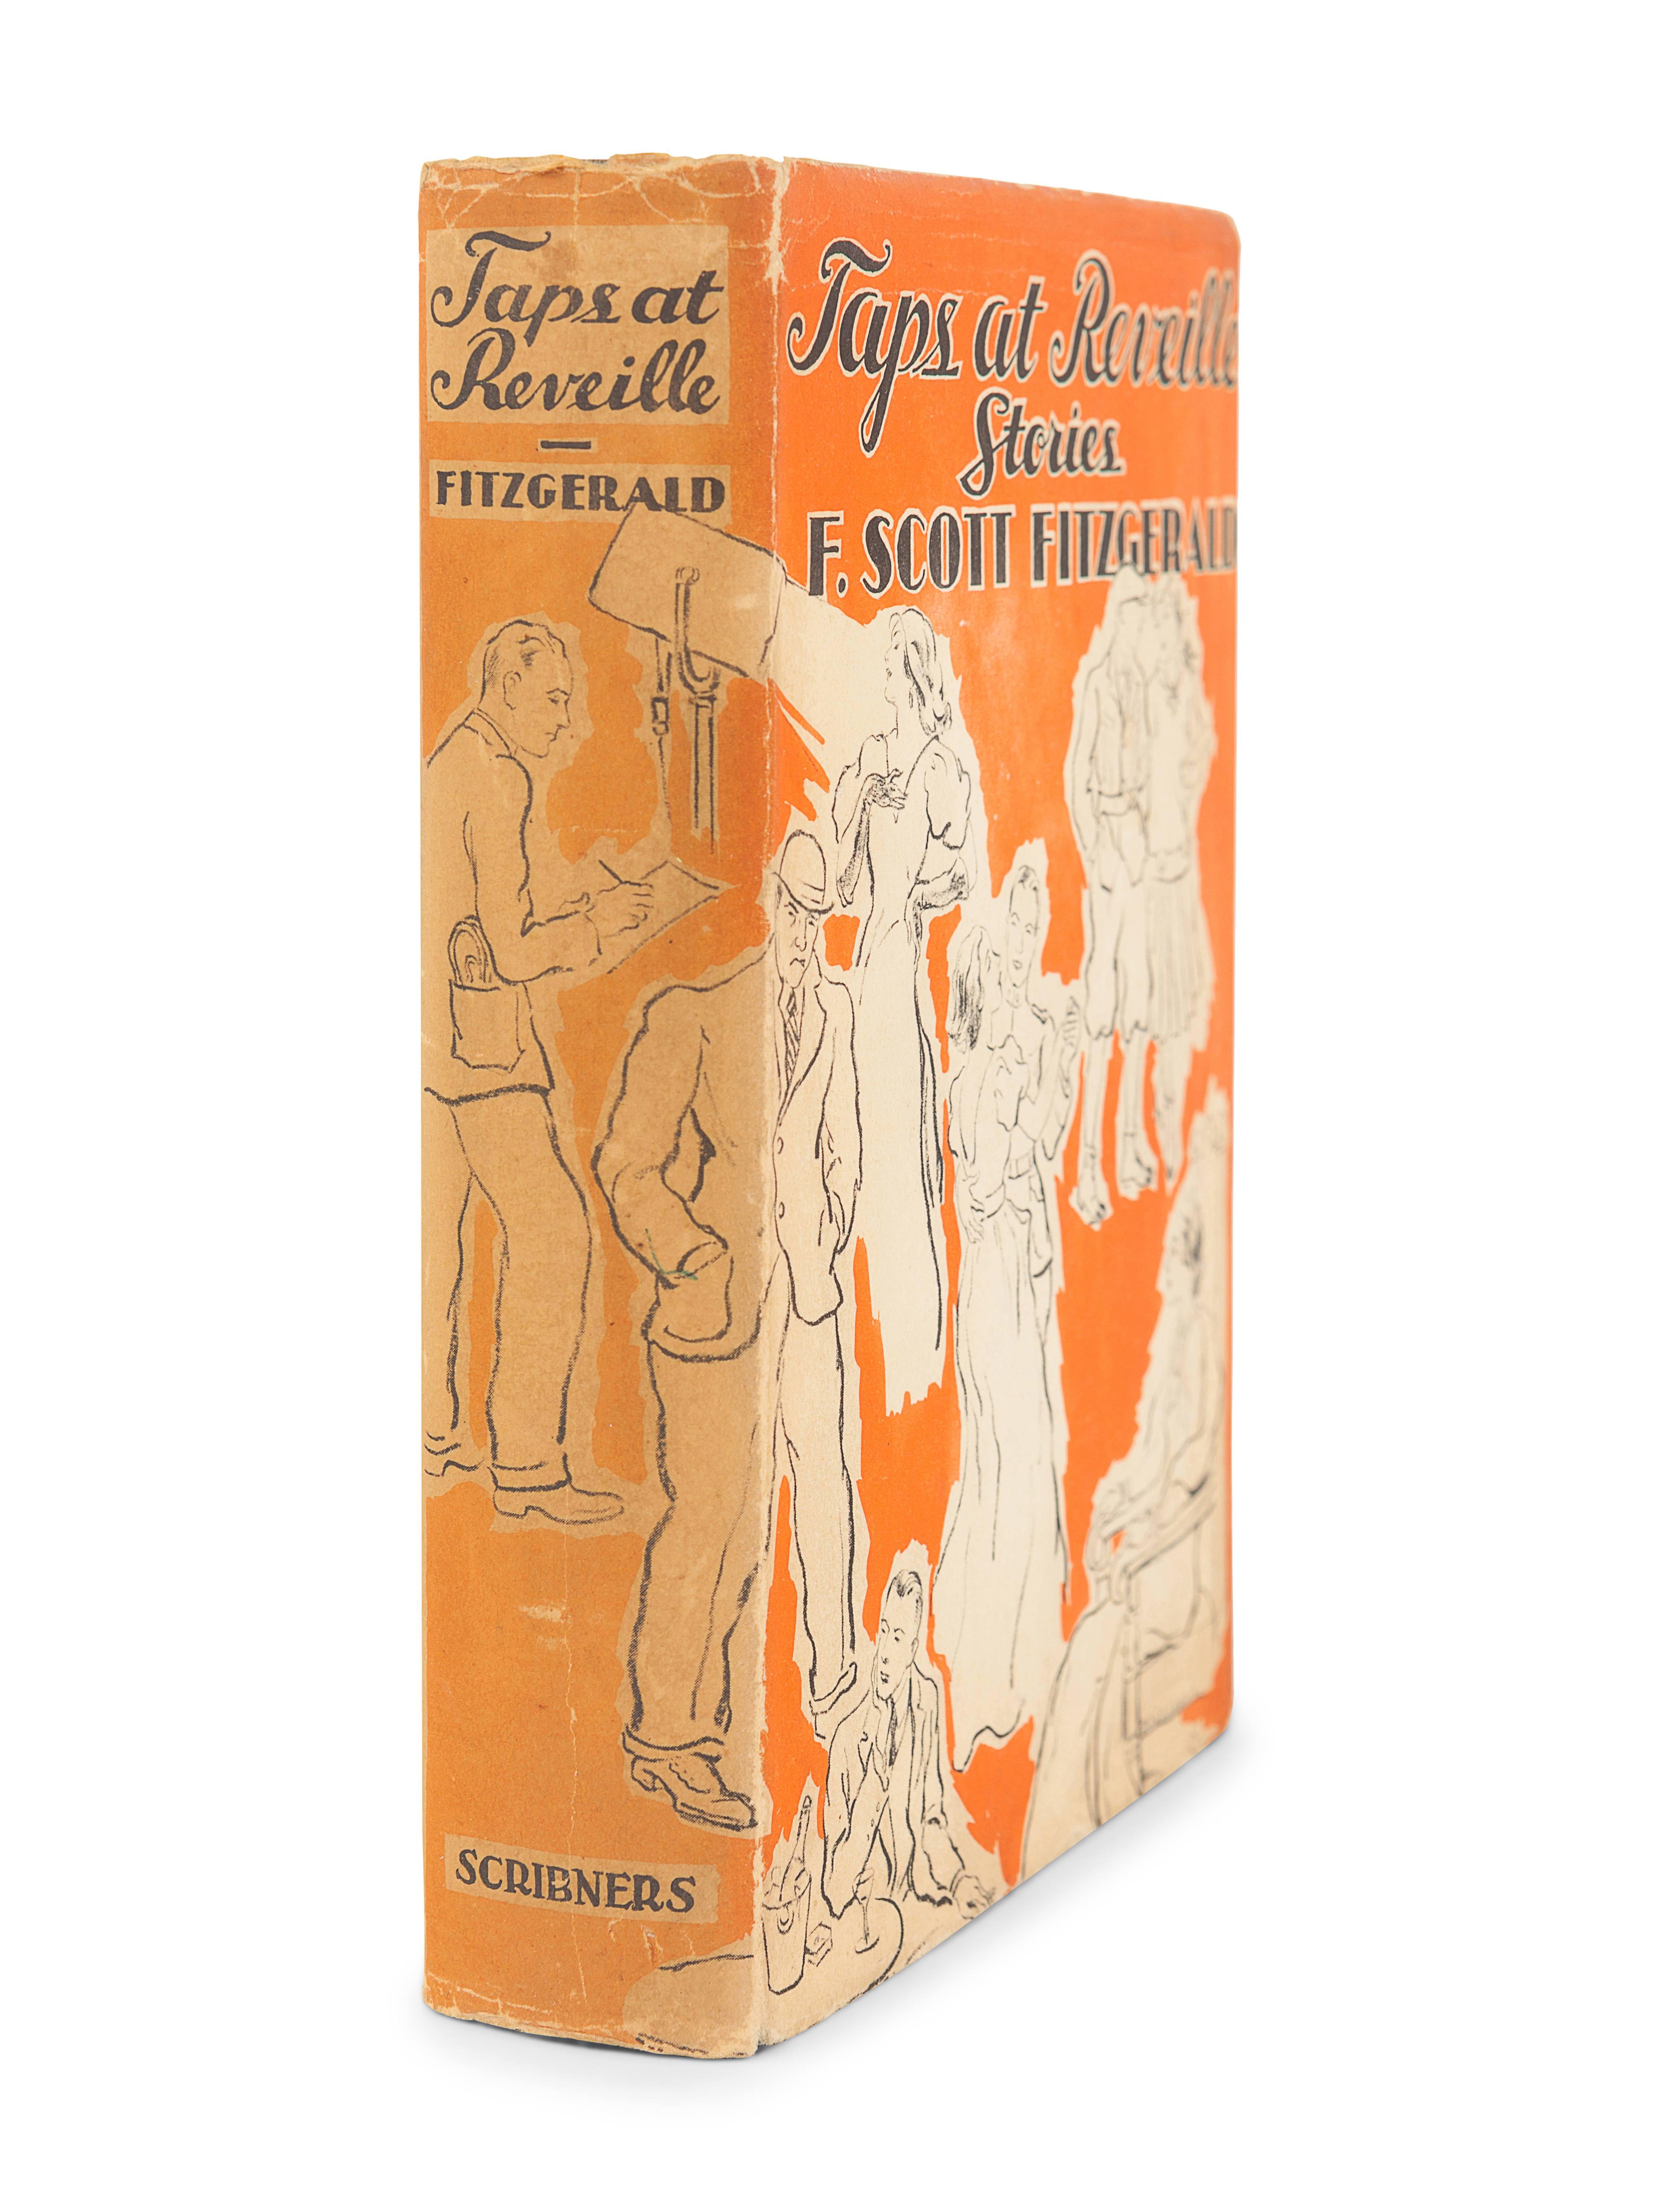 FITZGERALD, F. Scott (1896-1940). Taps at Reveille. New York: Scribner's, 1935. - Image 2 of 3